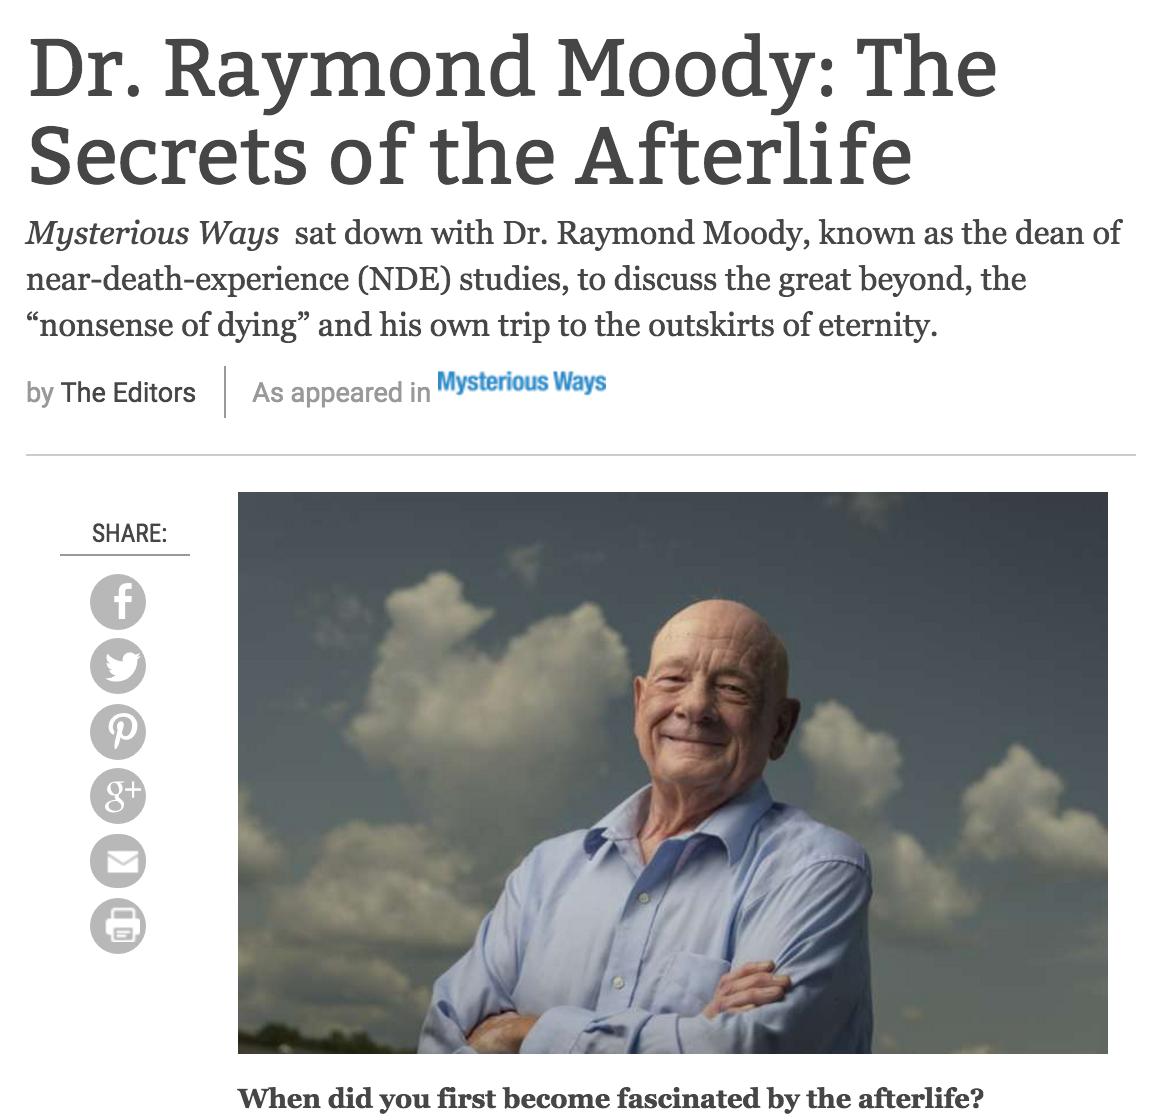 Q&A: Dr. Raymond Moody